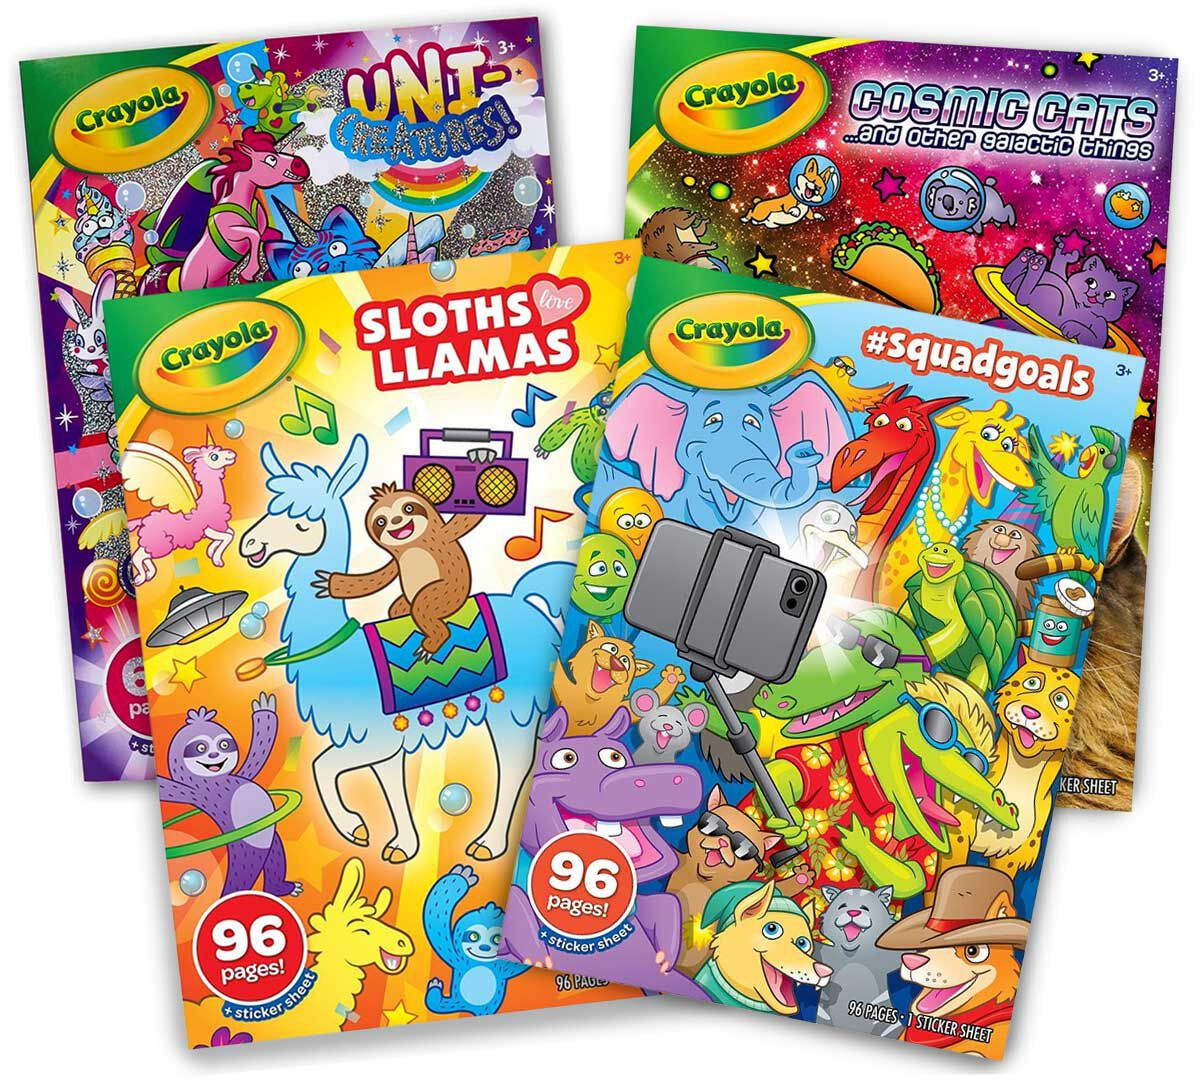 Animal Coloring Books, Cats, Unicorns & More Crayola.com Crayola